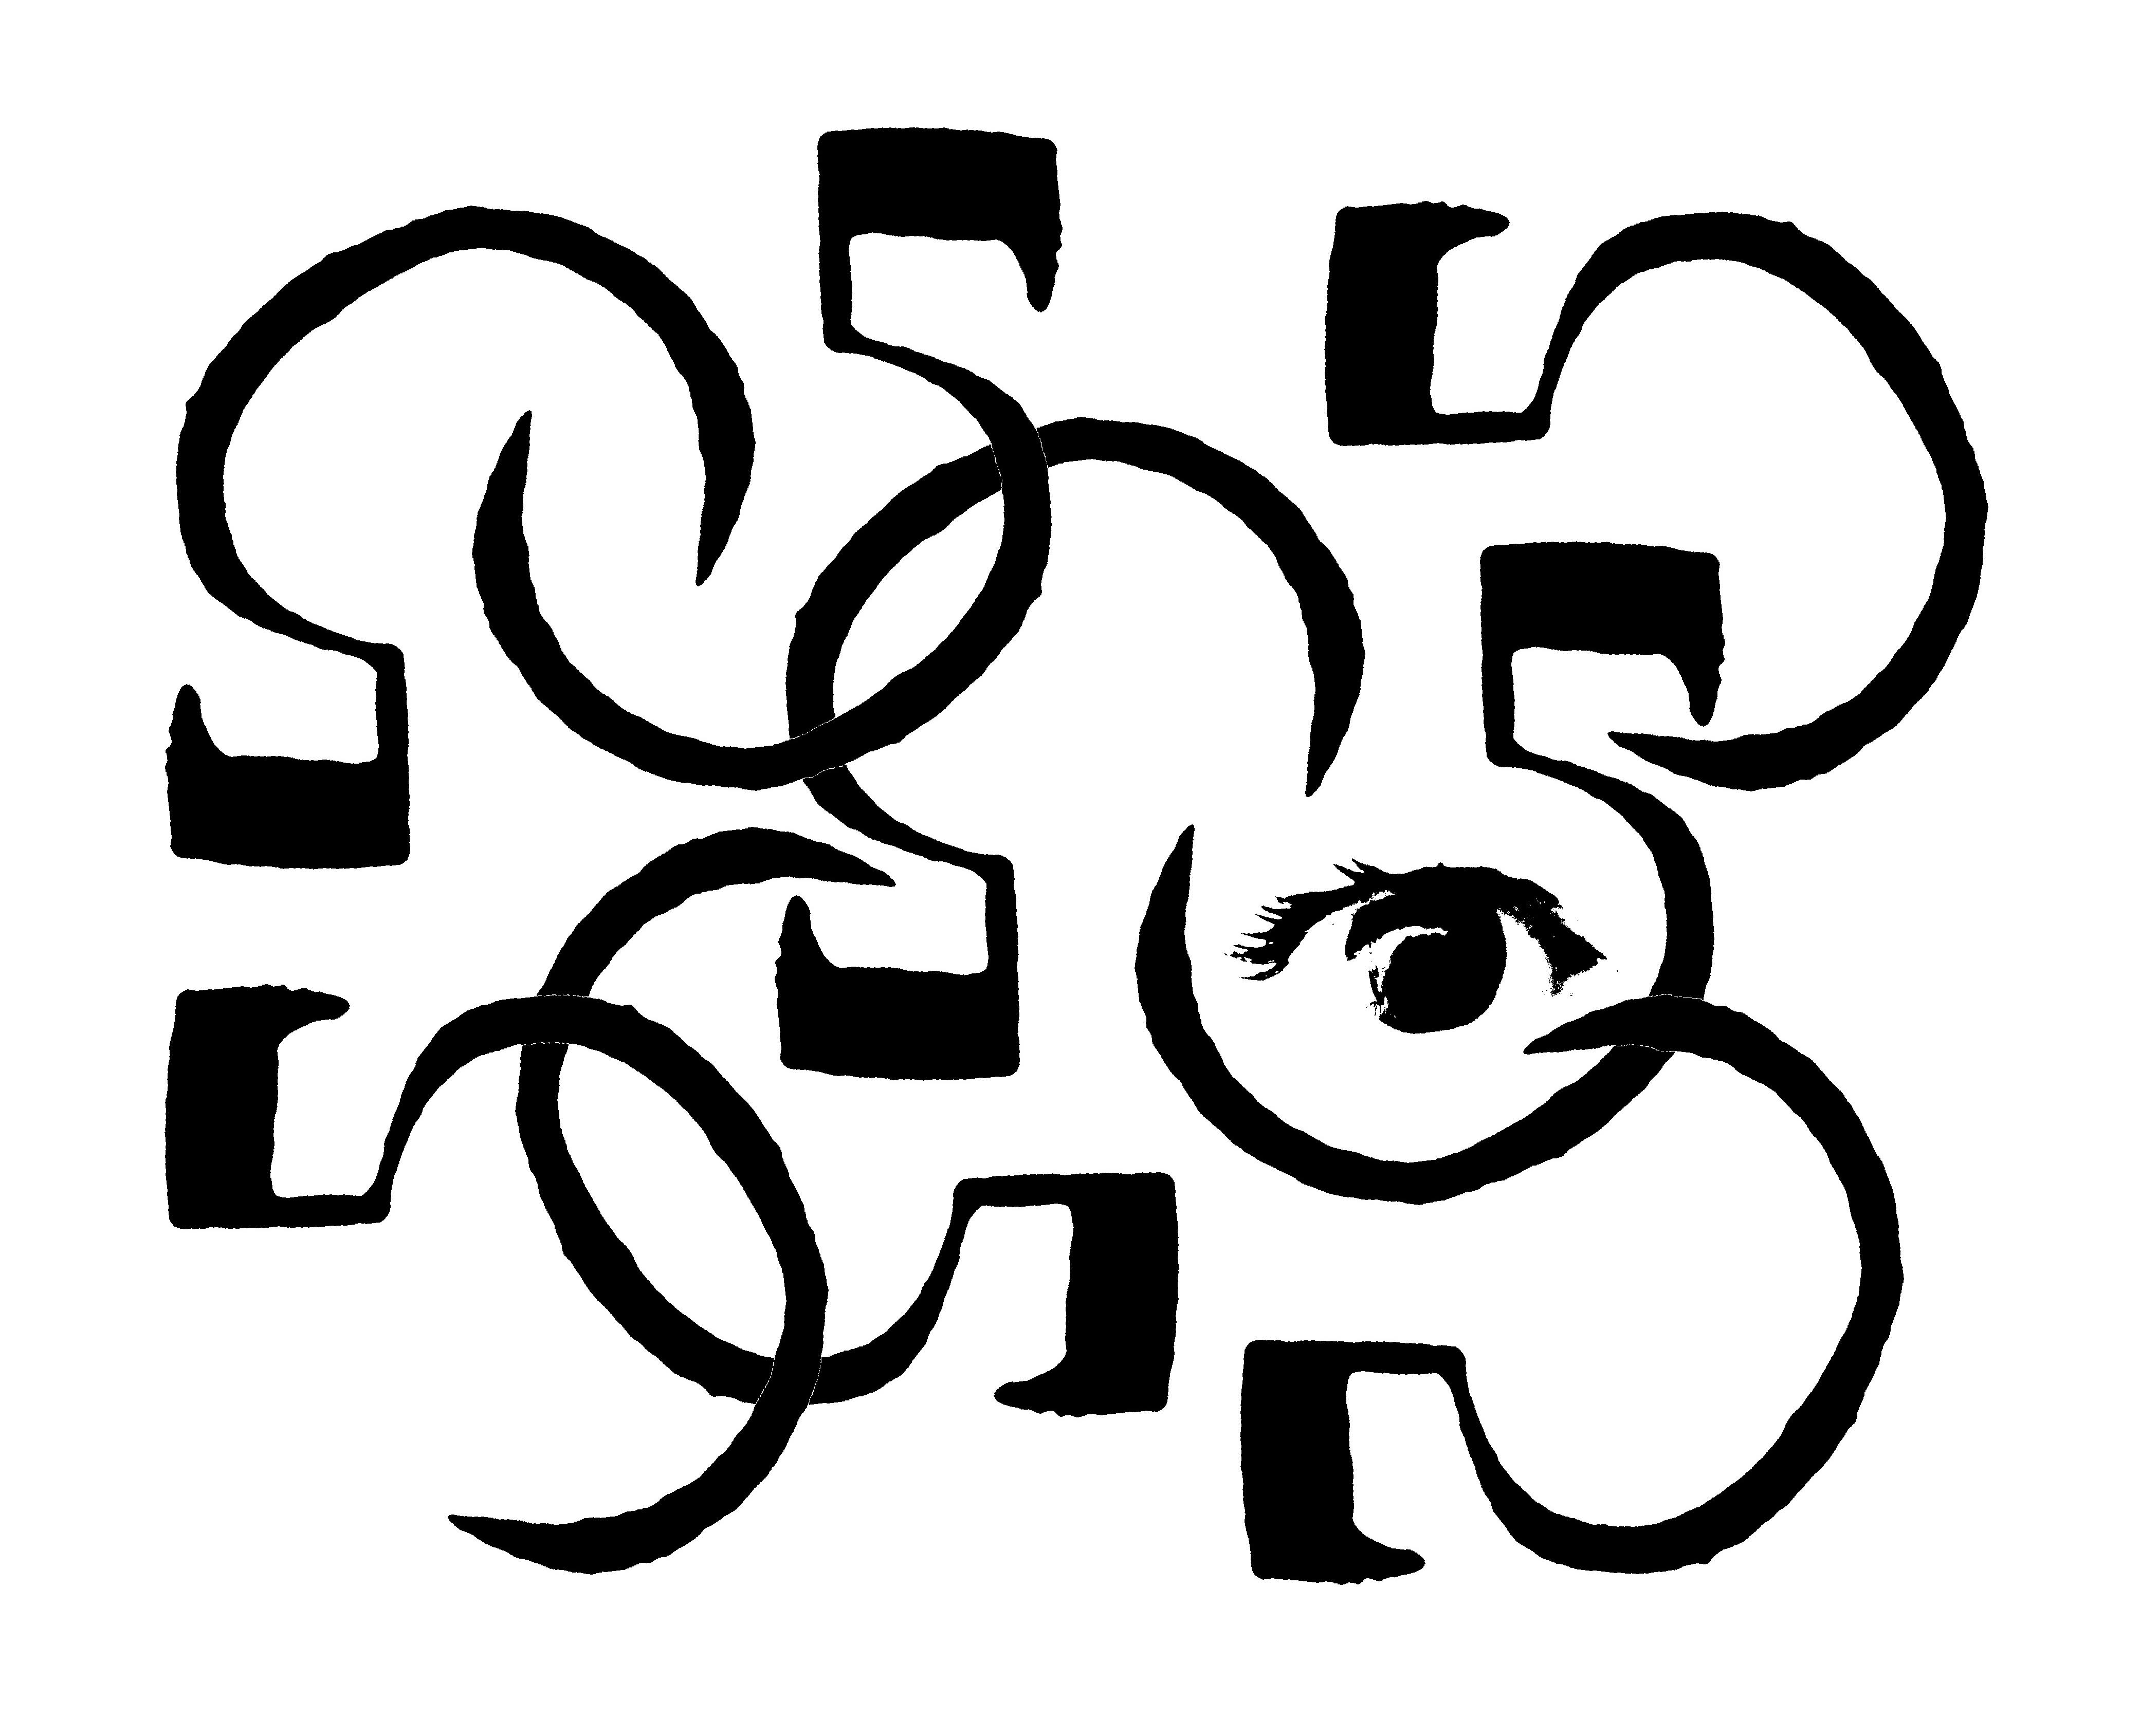 Gambar Abstrak Tekstur Pola Grayscale Satu Warna Fon Bw